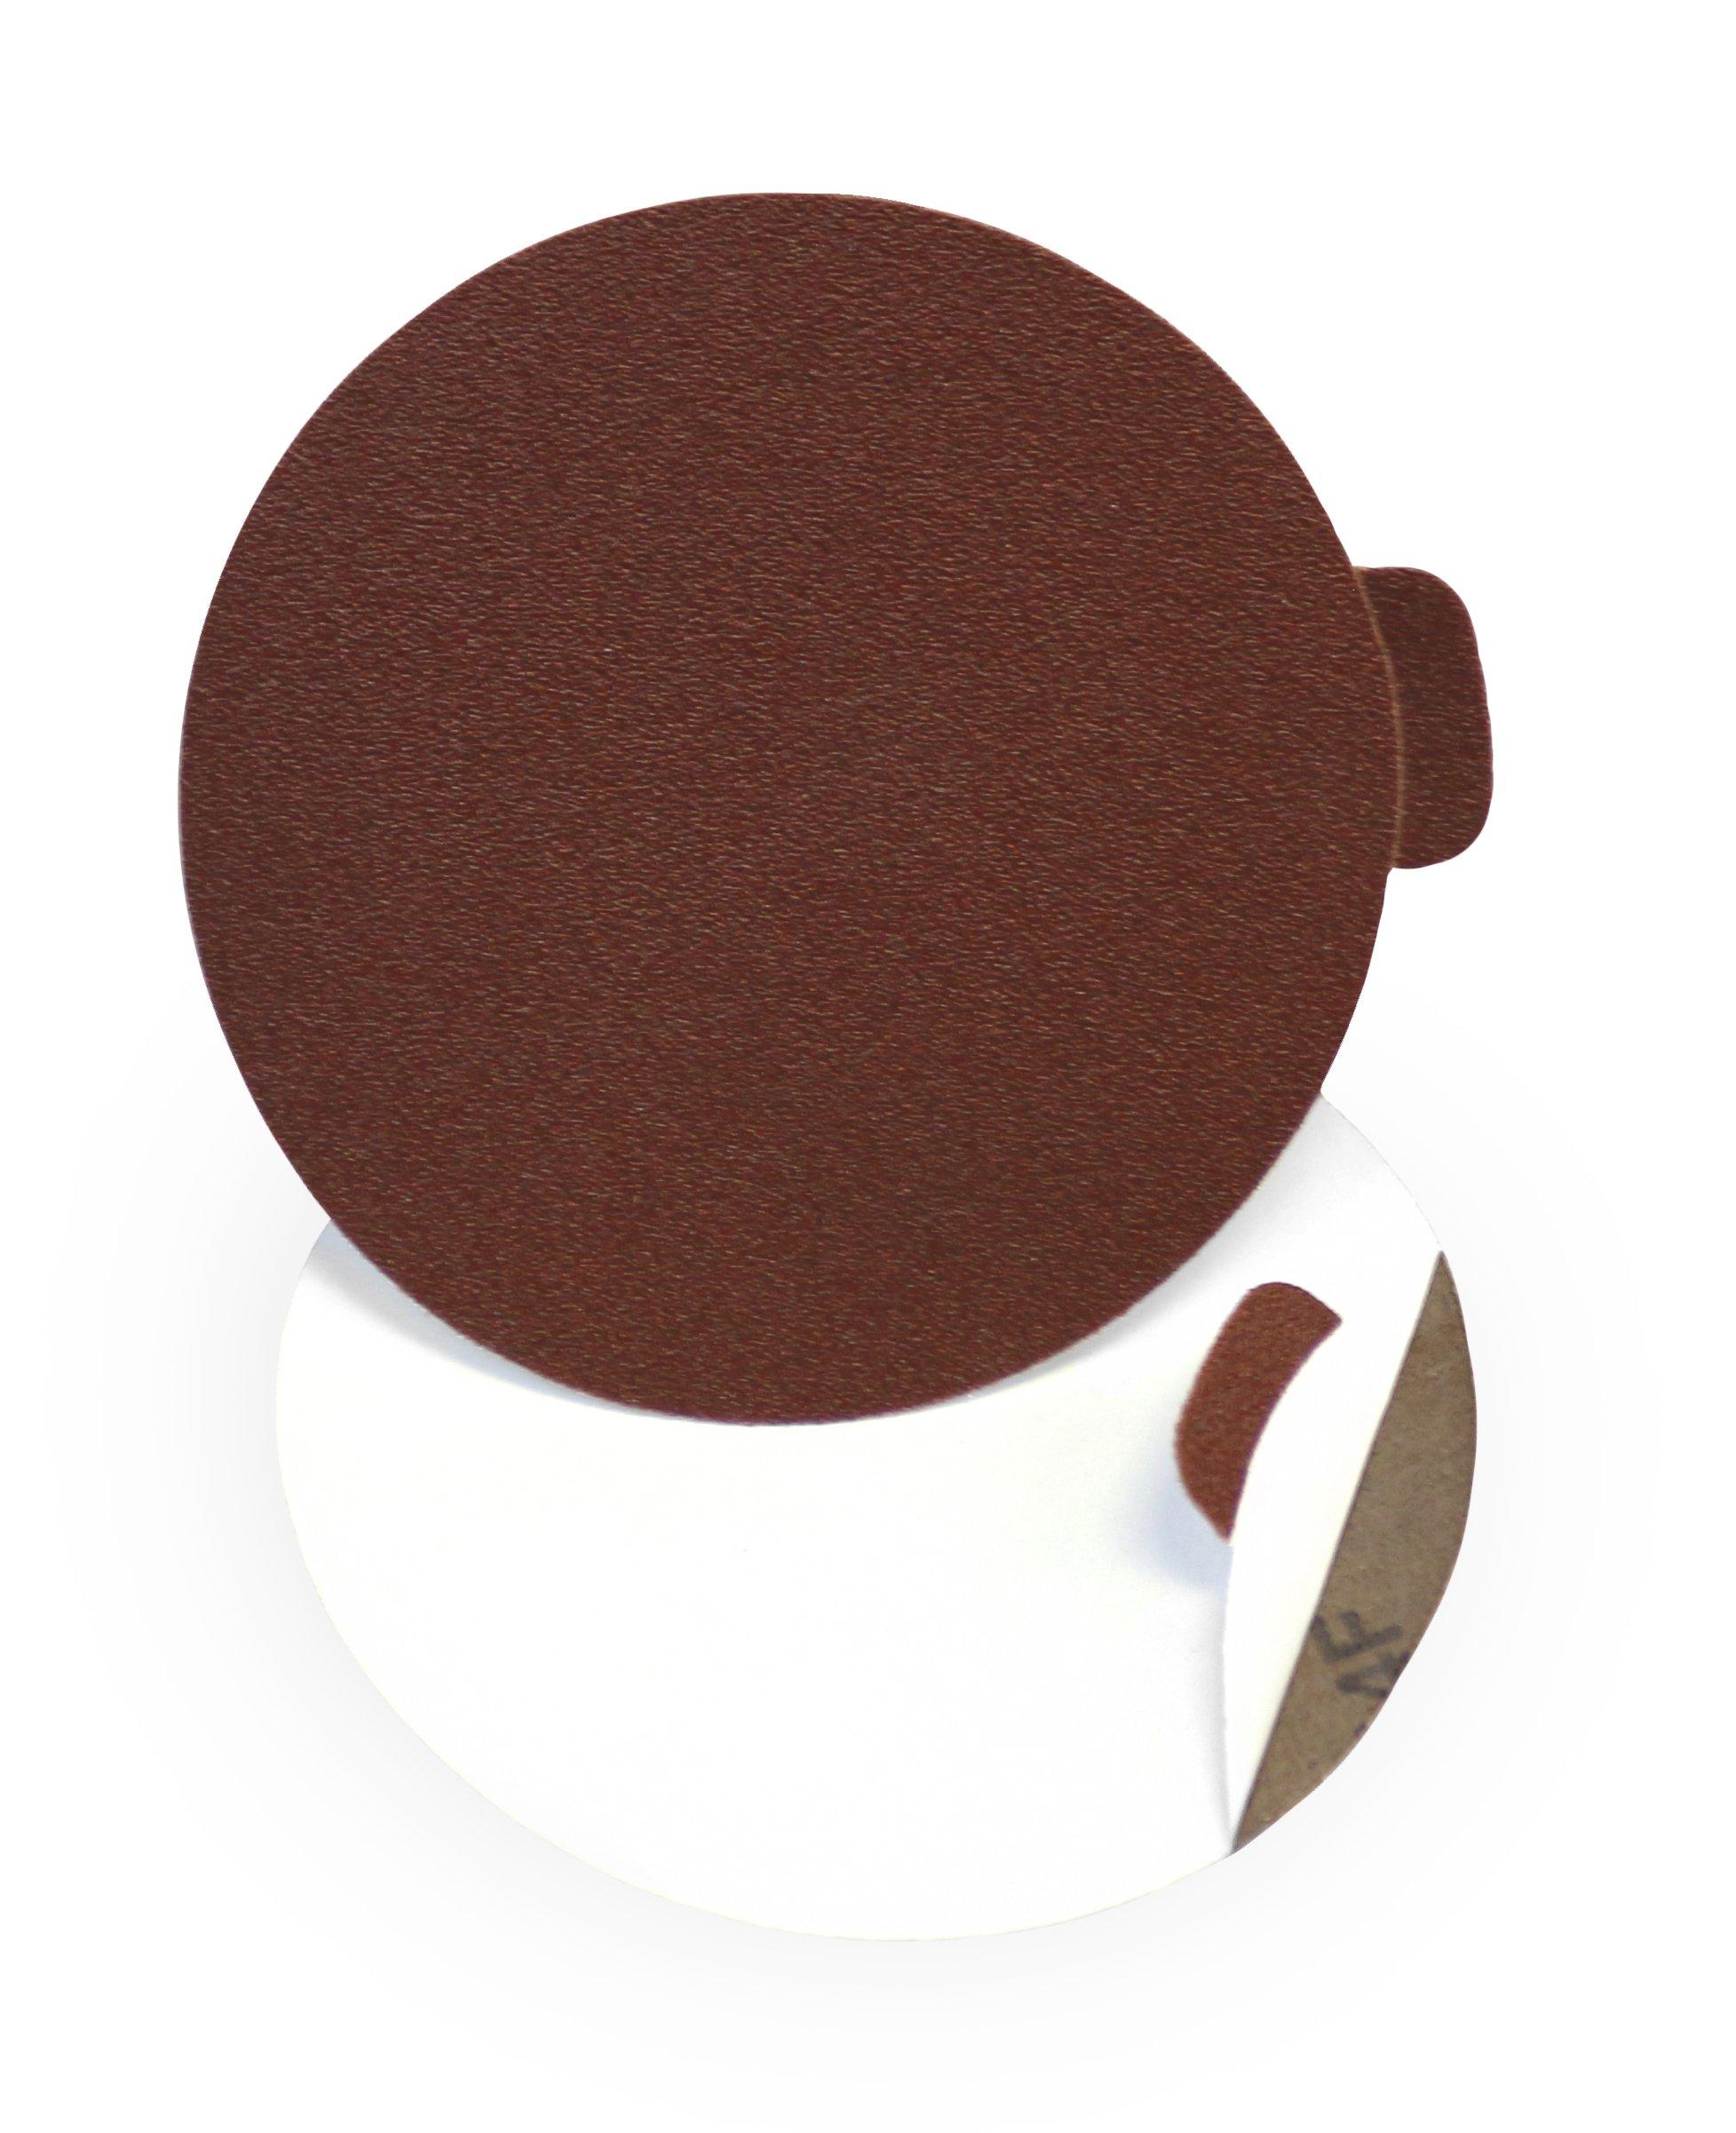 VSM 88367 PSA Cloth Disc, 5'' Diameter, 60 Grit, Aluminum Oxide (Pack of 100) by VSM